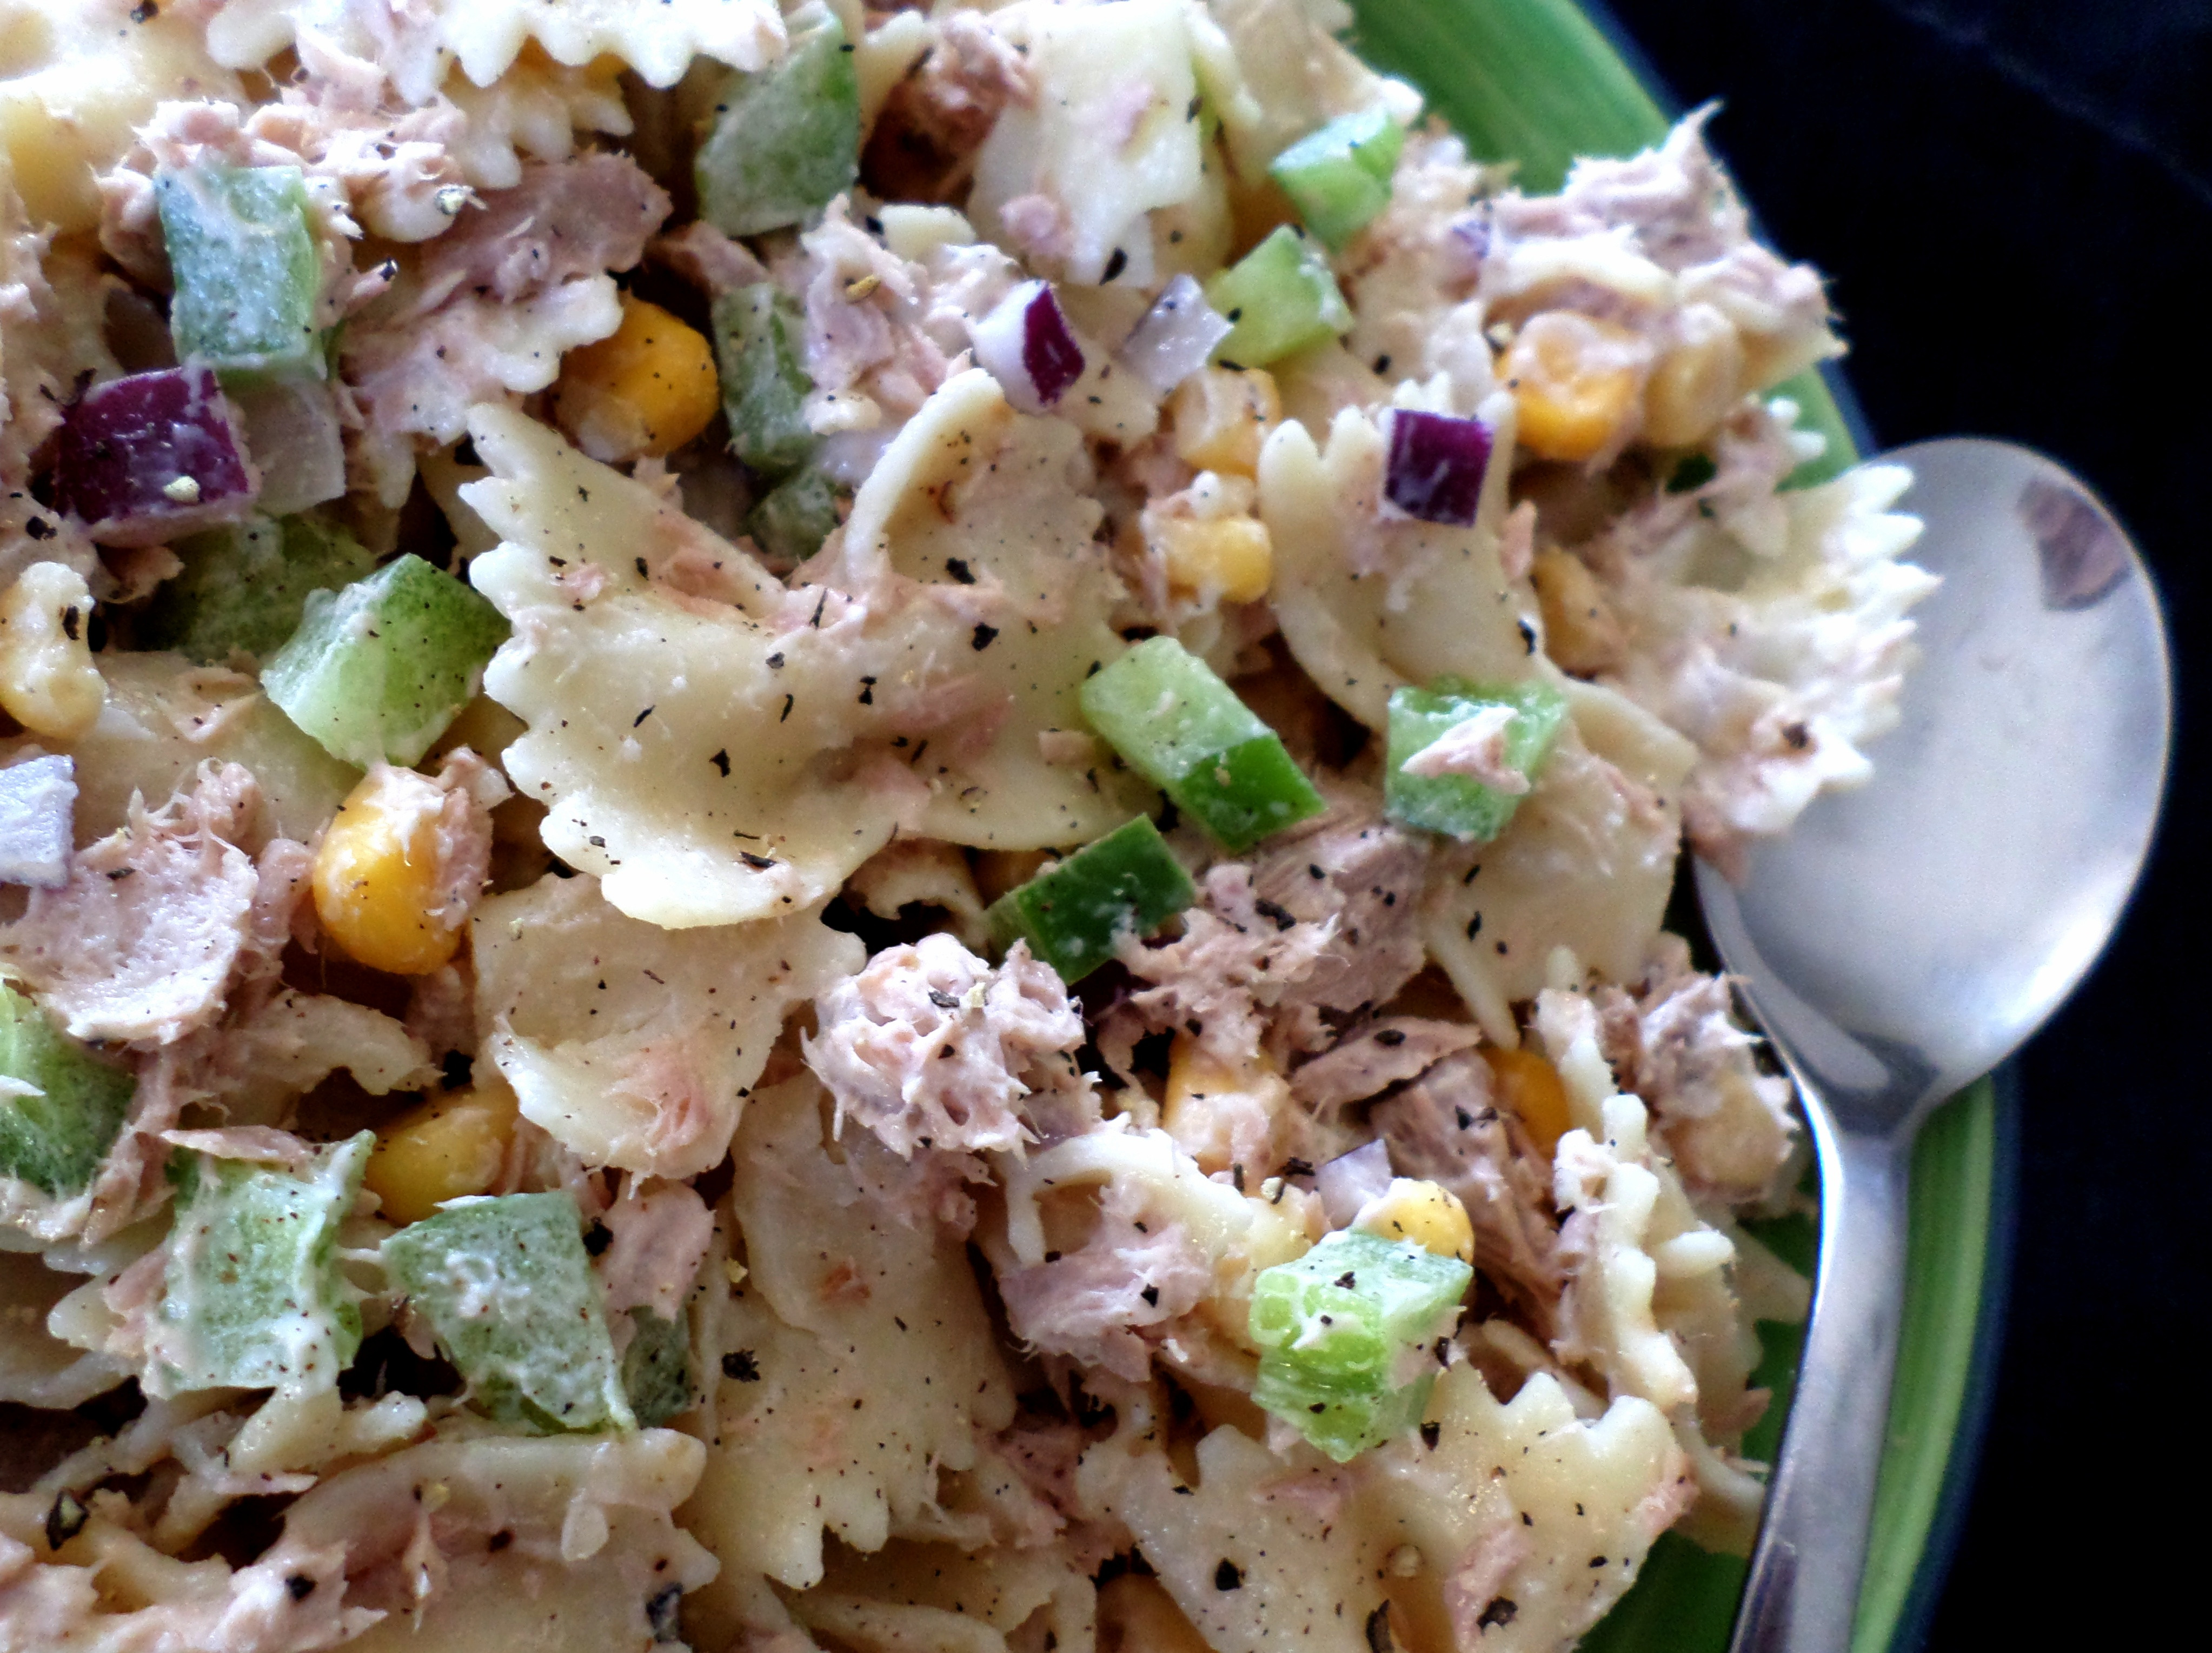 Tuna Pasta Salad Recipe  Tuna Pasta Salad with Lemon and Garlic Aioli